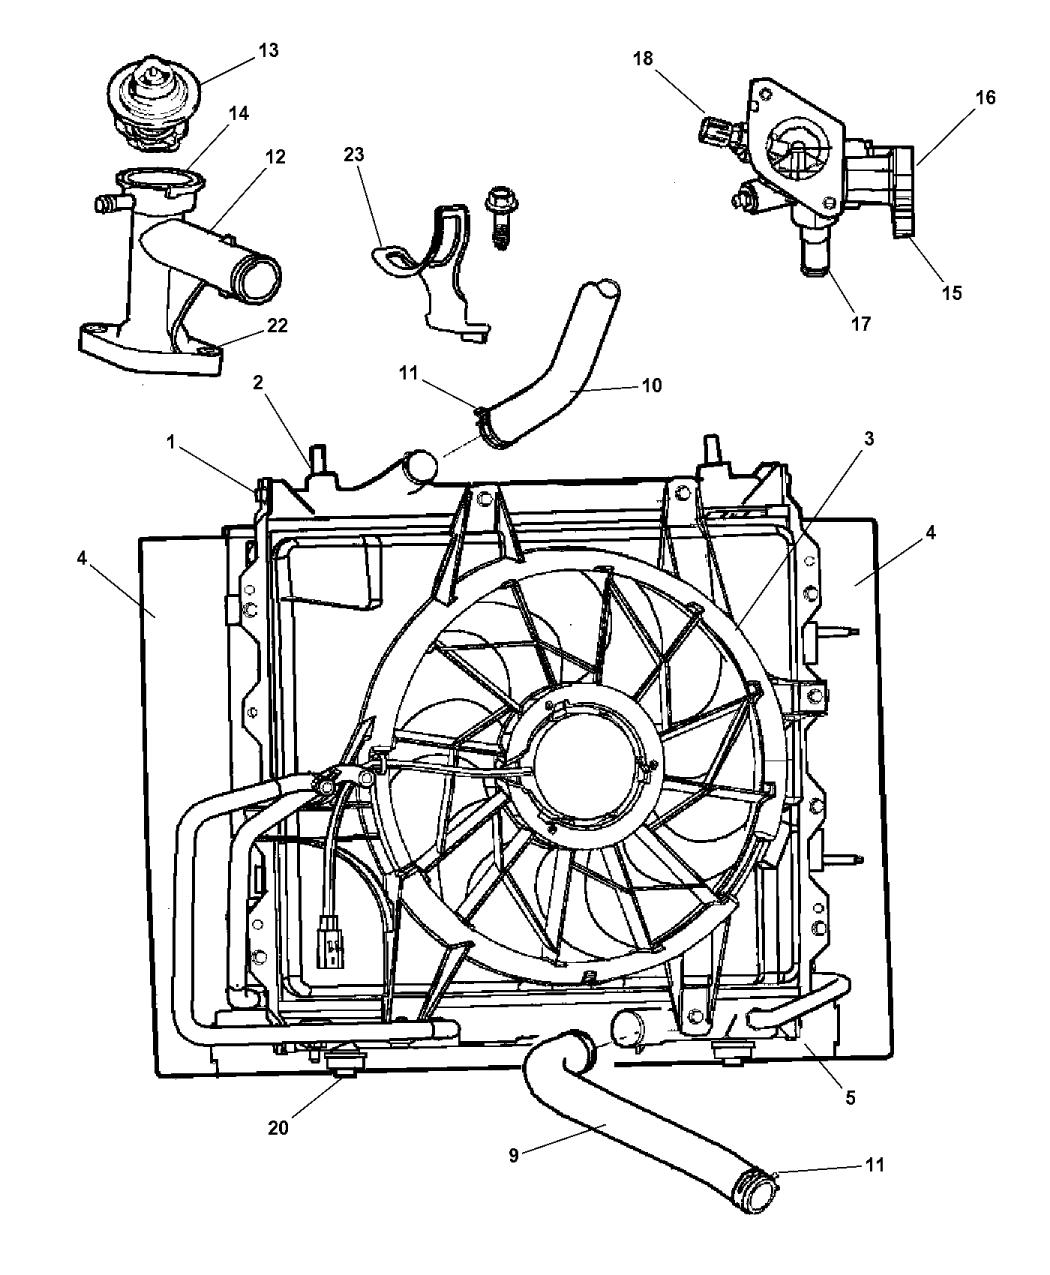 pt cruiser 2 4l engine parts diagram wiring library PT Cruiser Timing Chain 2007 chrysler pt cruiser radiator \u0026 related parts